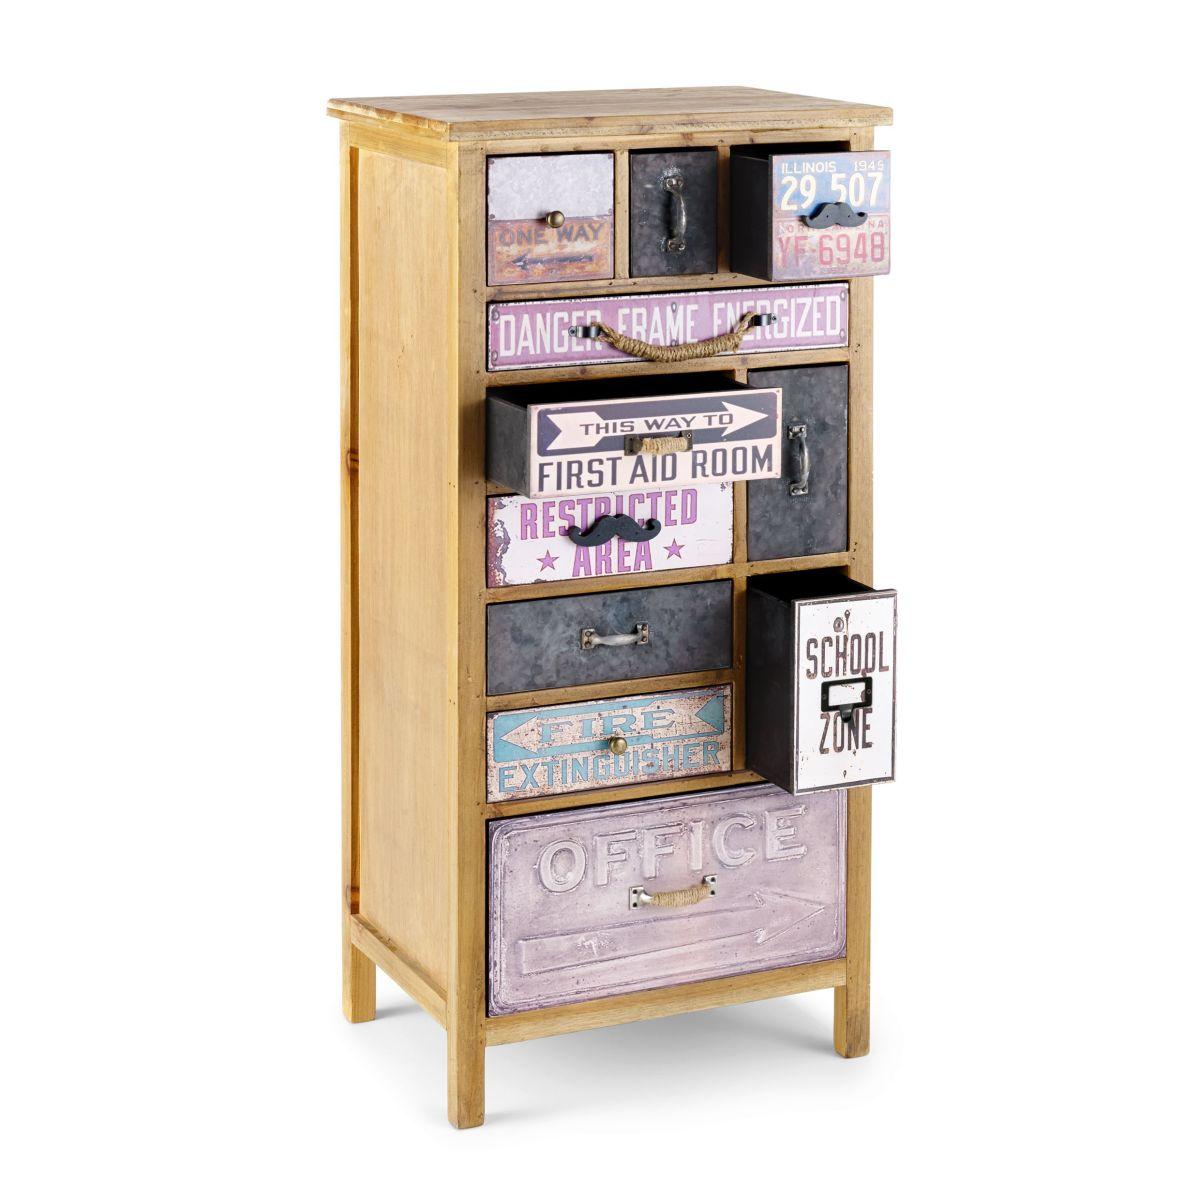 kommode fabi aus holz metall papier leinen versandkostenfreie m bel online. Black Bedroom Furniture Sets. Home Design Ideas